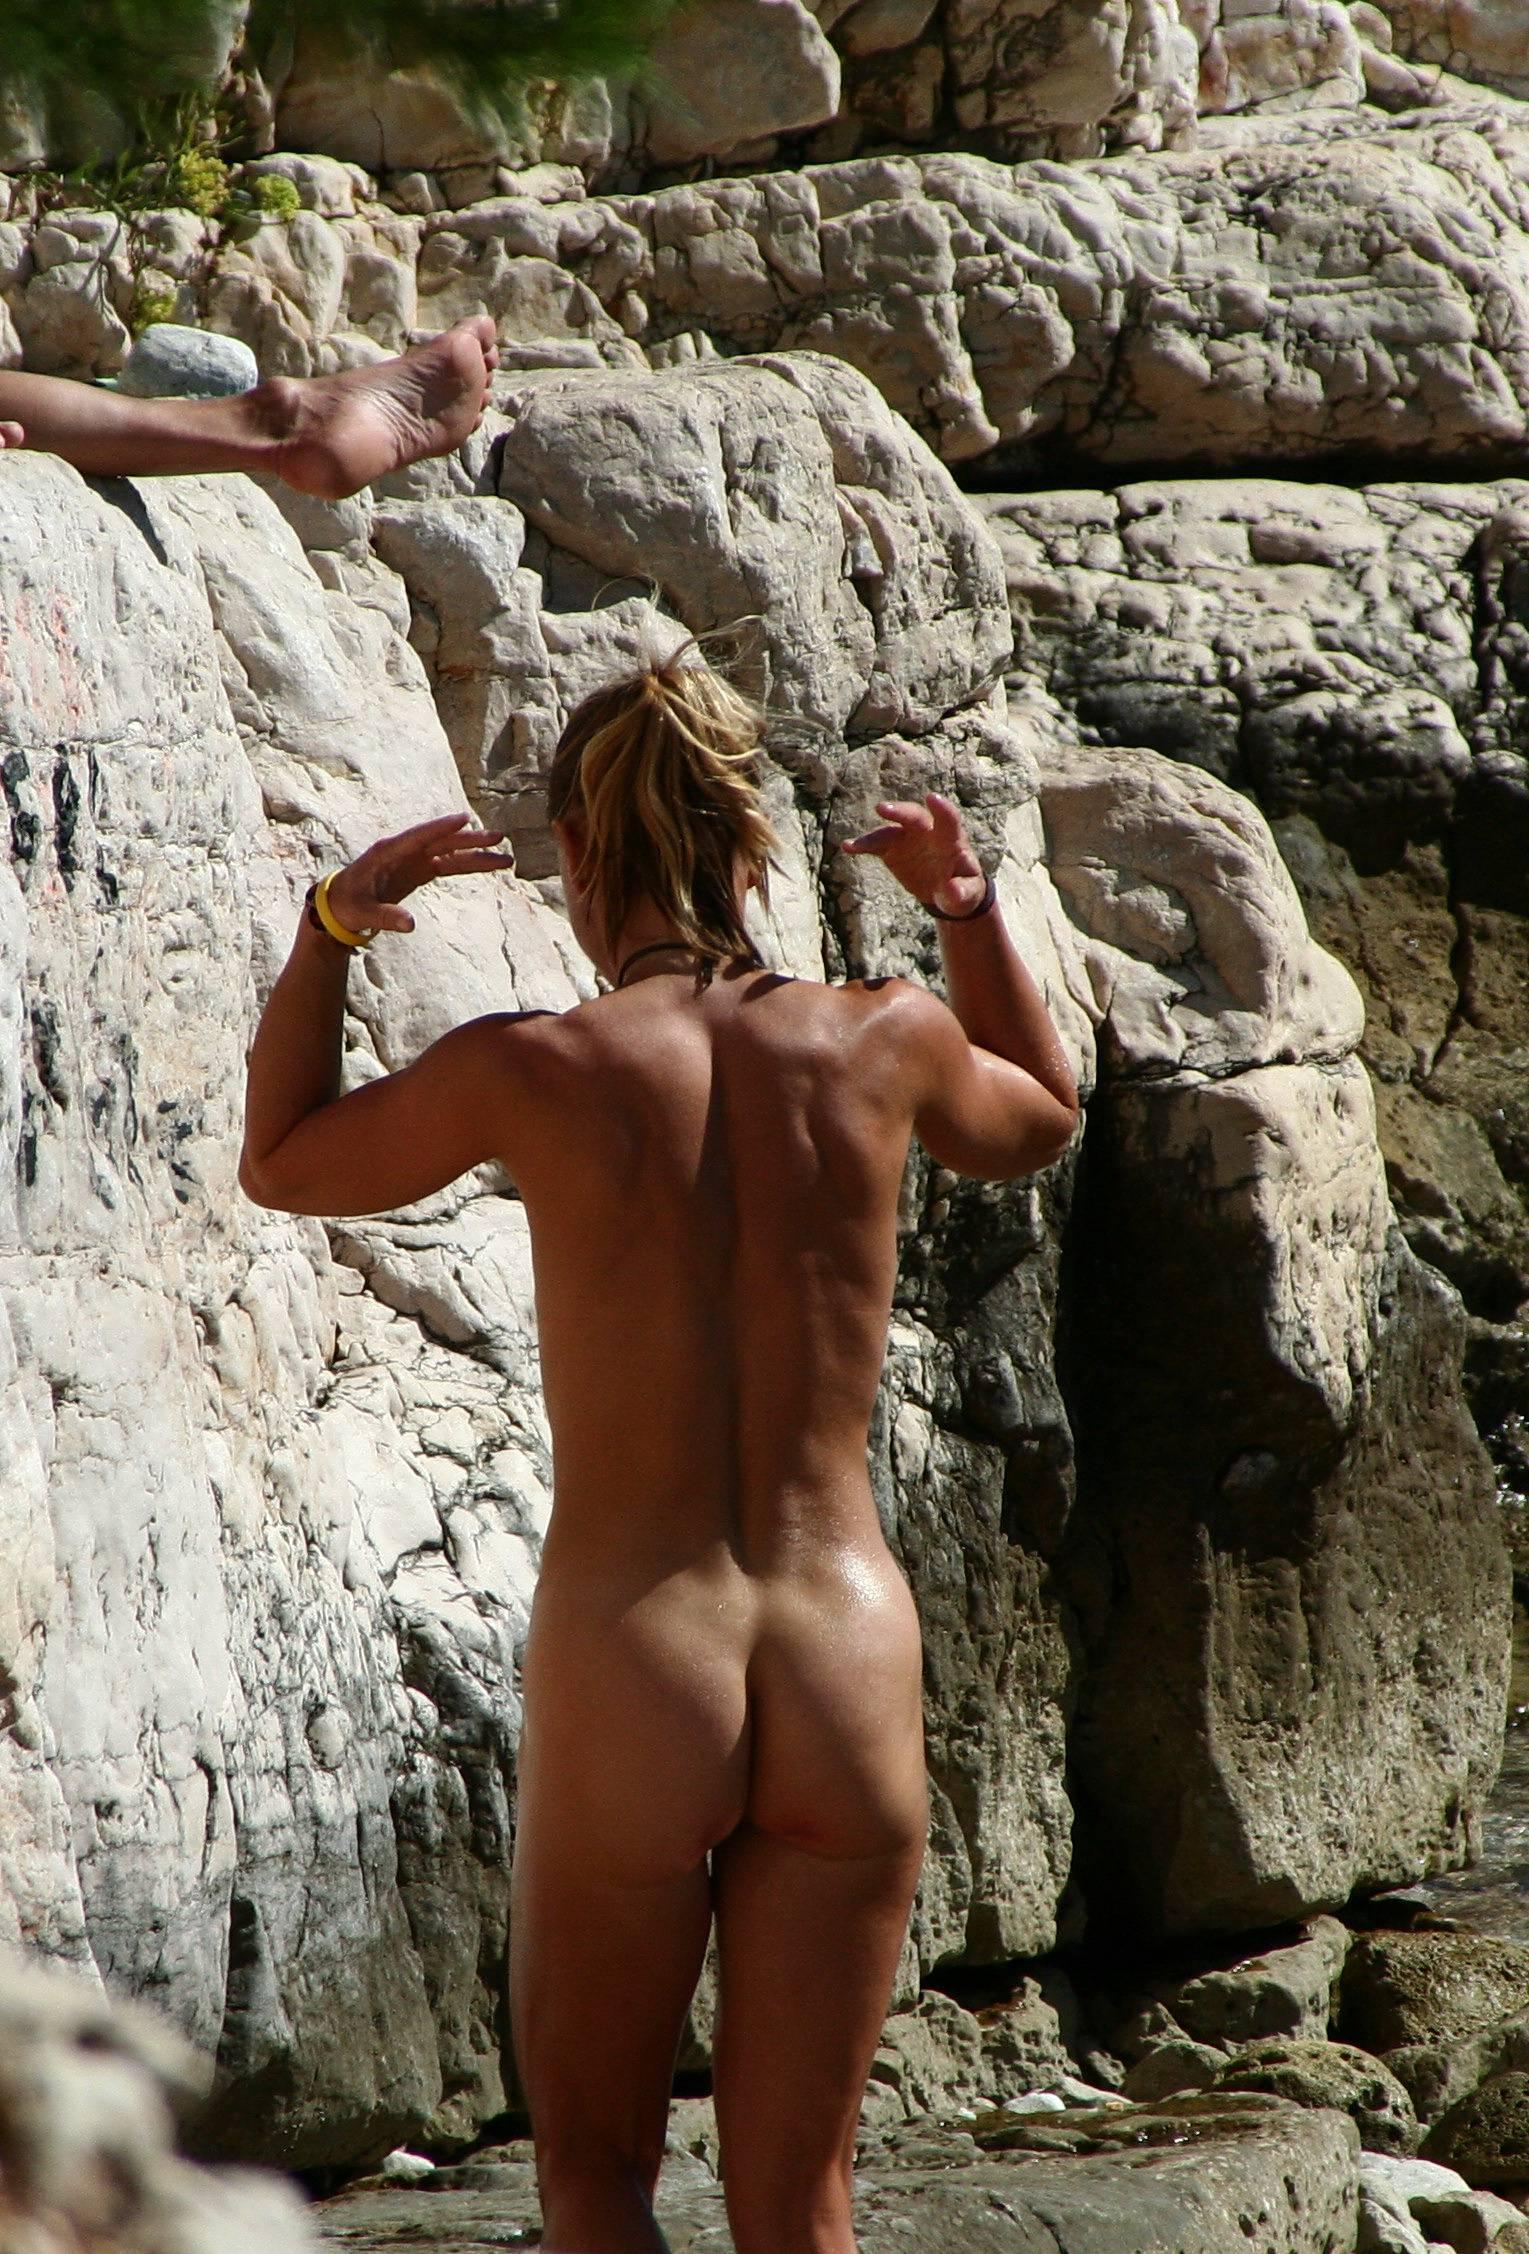 Nudist Gallery Rocky Crag Water Splash - 1